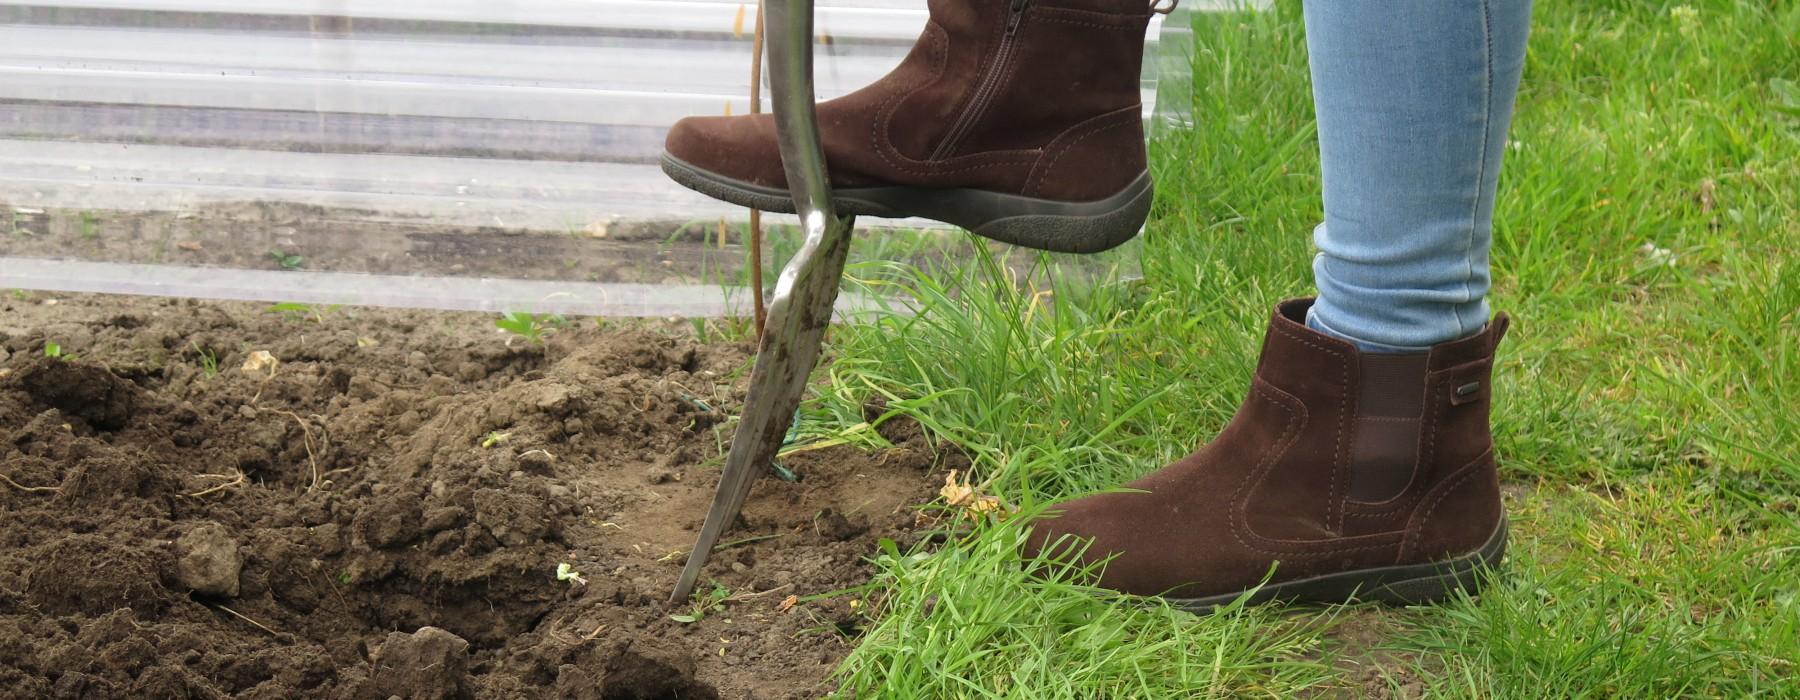 Gardening Footwear and Discount Code